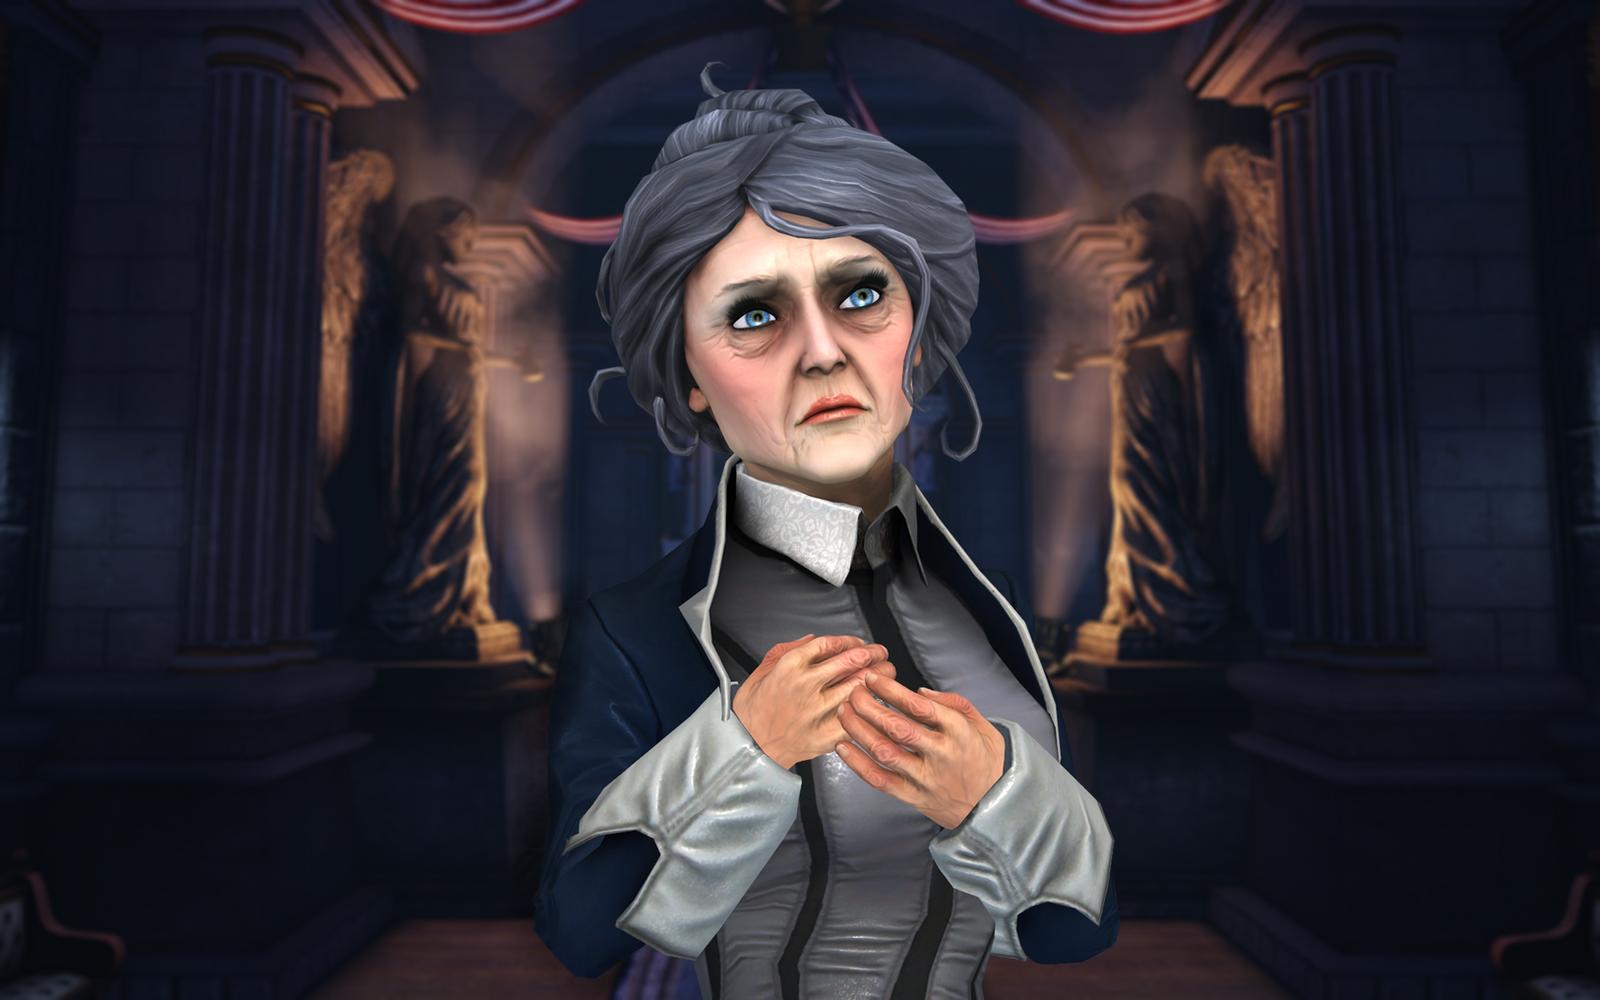 BioShock Infinite - Elizabeth Wallpaper 11 by WhrAreMyDragons on ...